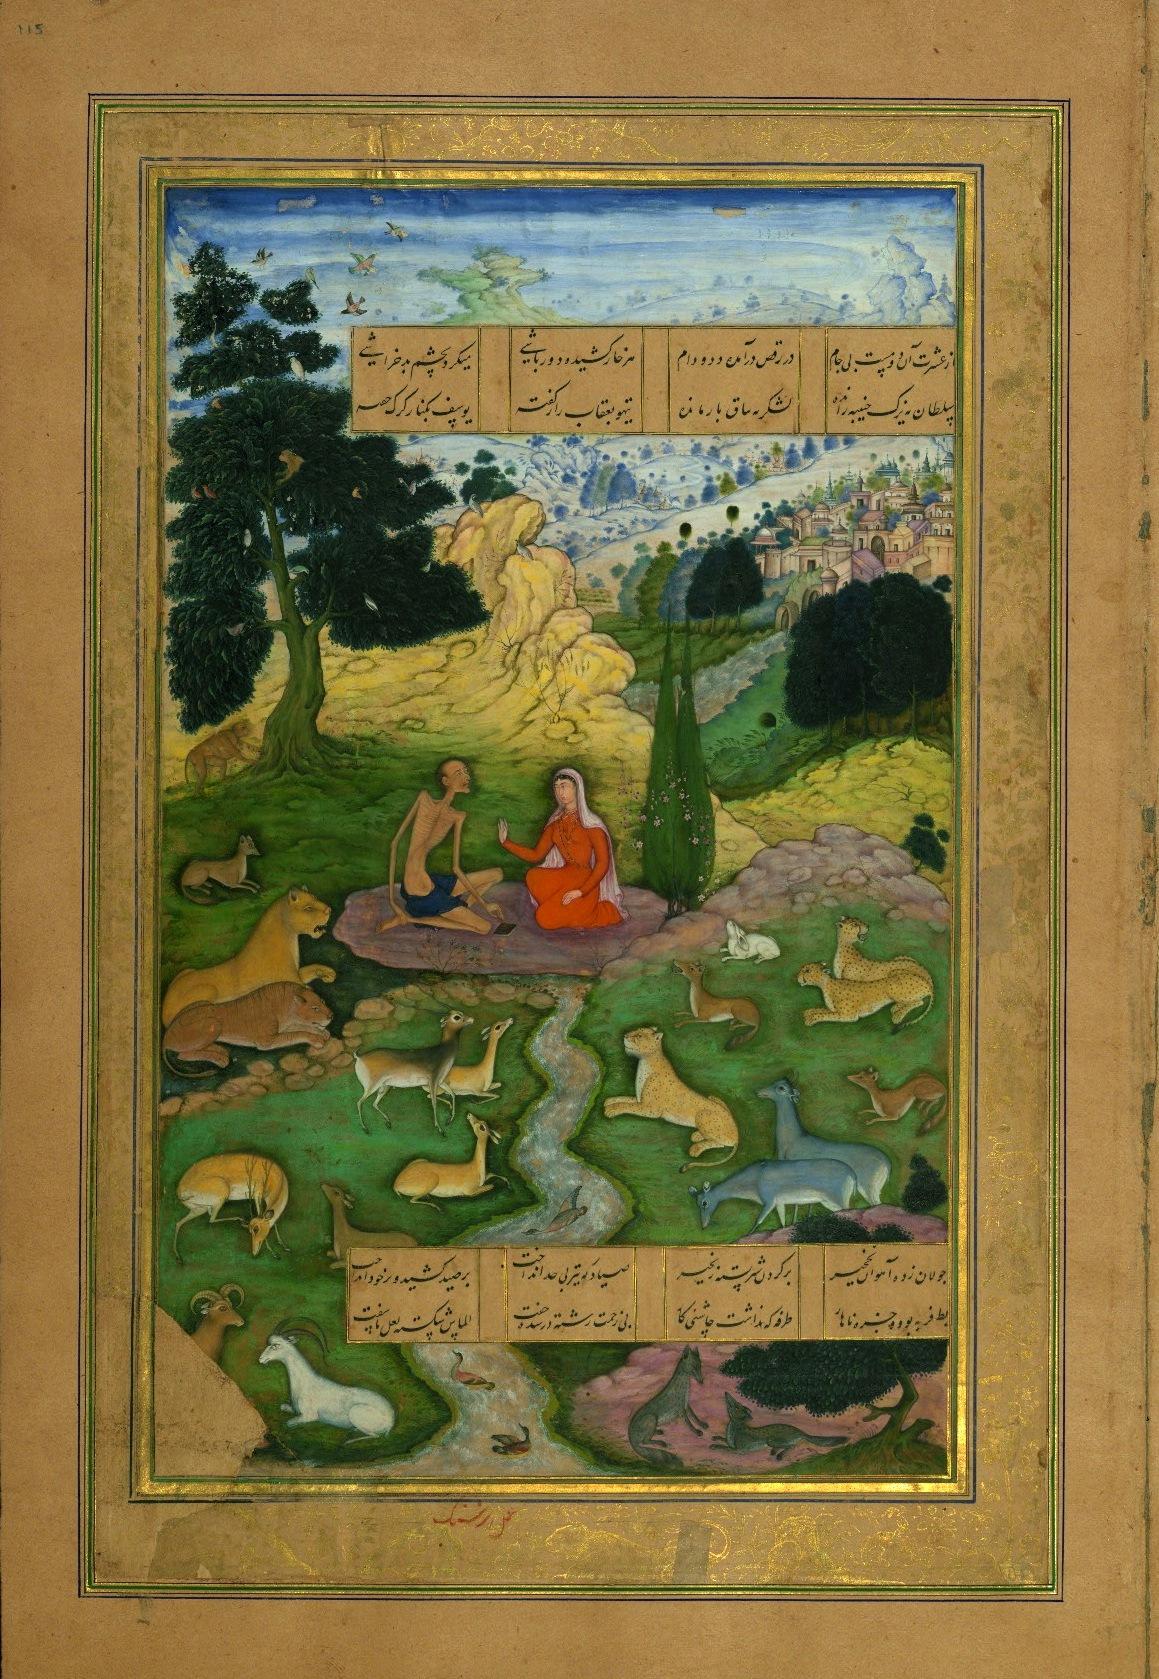 Laila visits Majnun in the wilderness, scene from Khamsah, Five Poems of Amir Khusro, ca. 14th century.